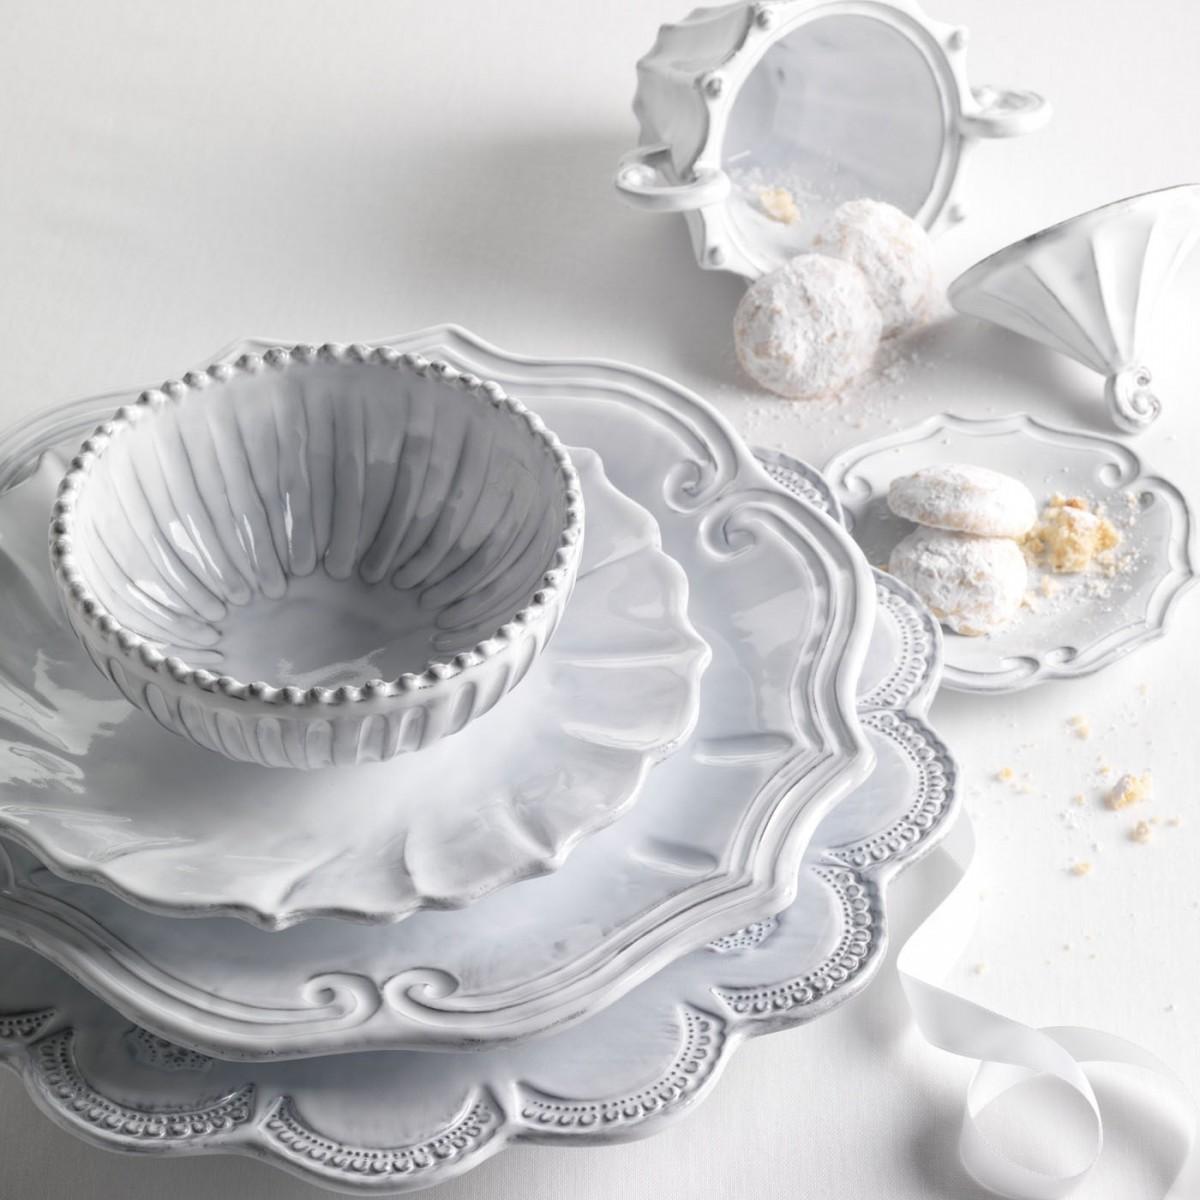 vietri-incanto-white-amore-plate.jpg